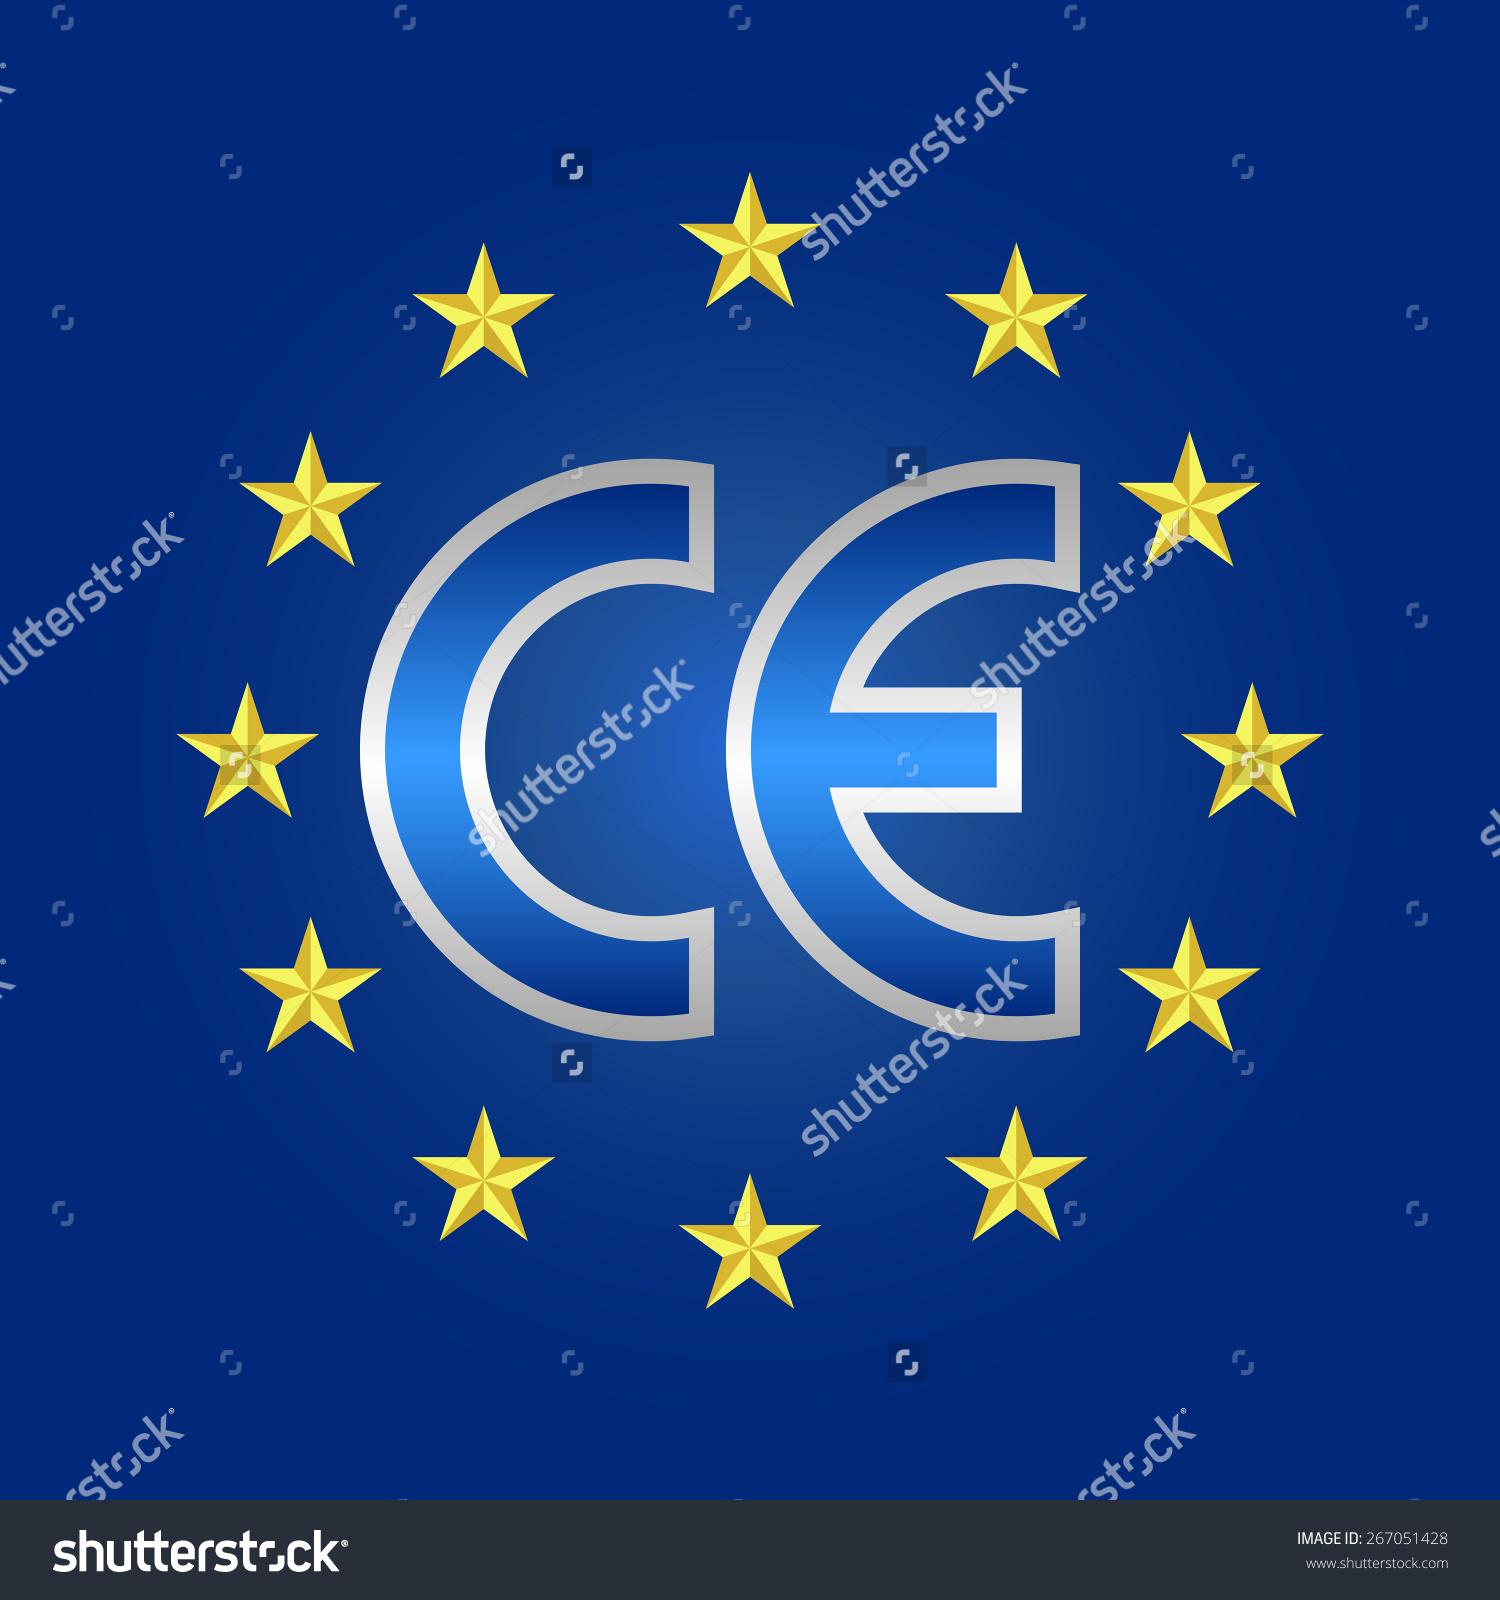 Ce Mark Blue European Quality Conformity Stock Vector 267051428.